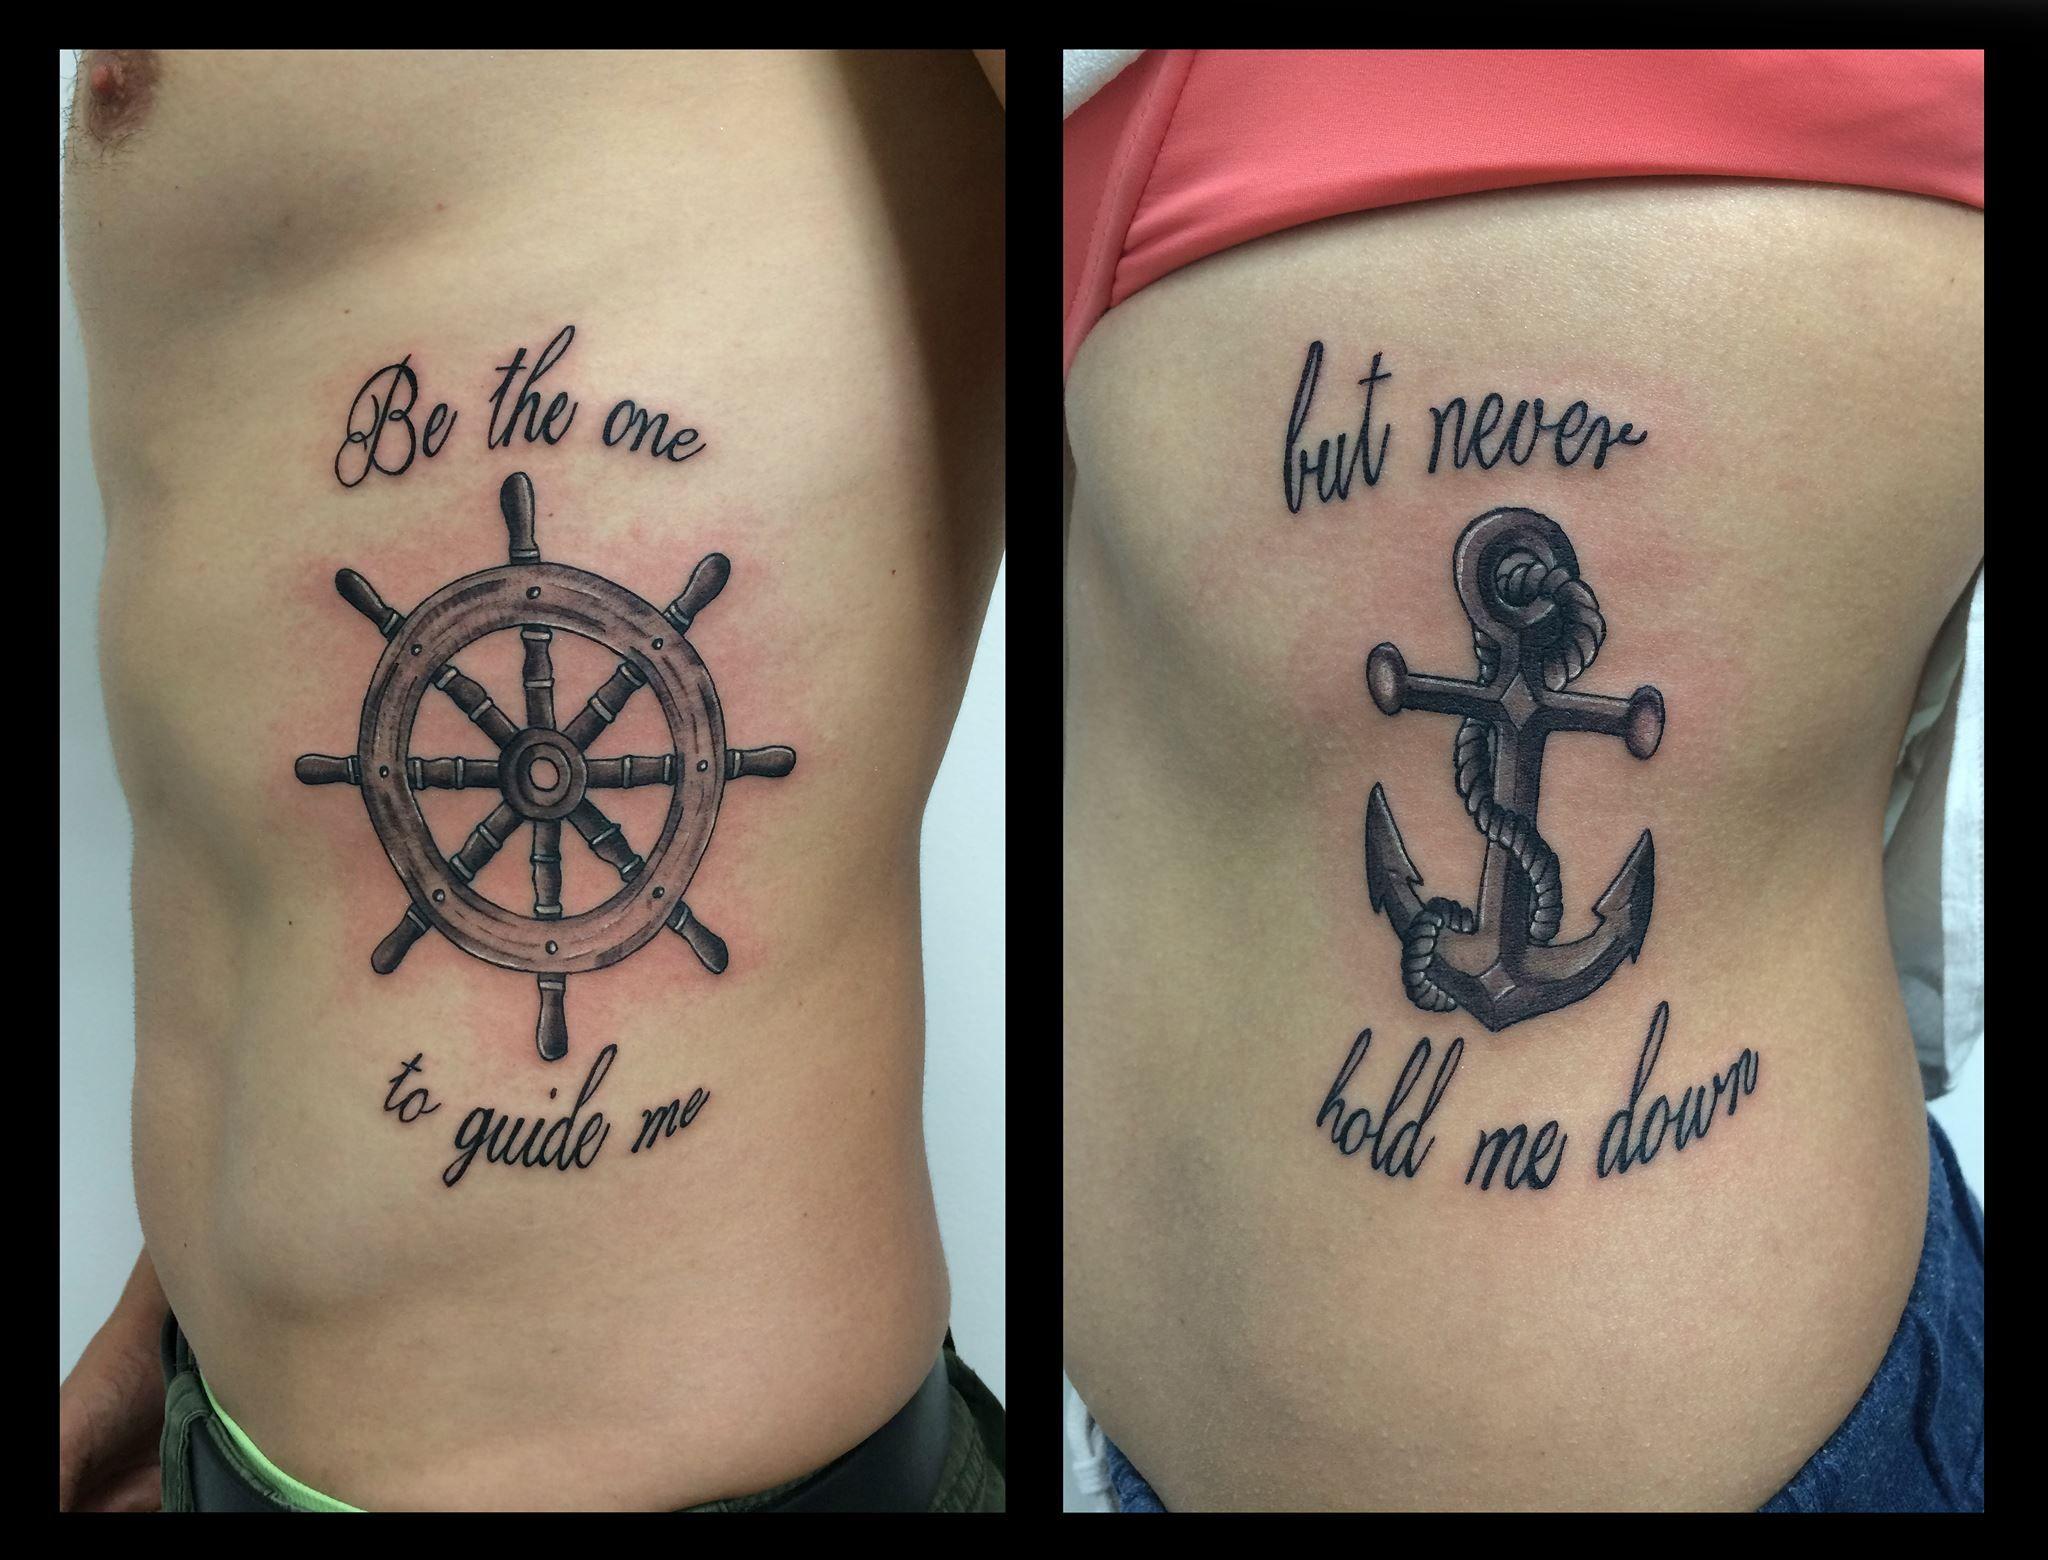 Tattoo Pareja Ancla Y Timon Bff Tatuajes Tatuaje Infinito